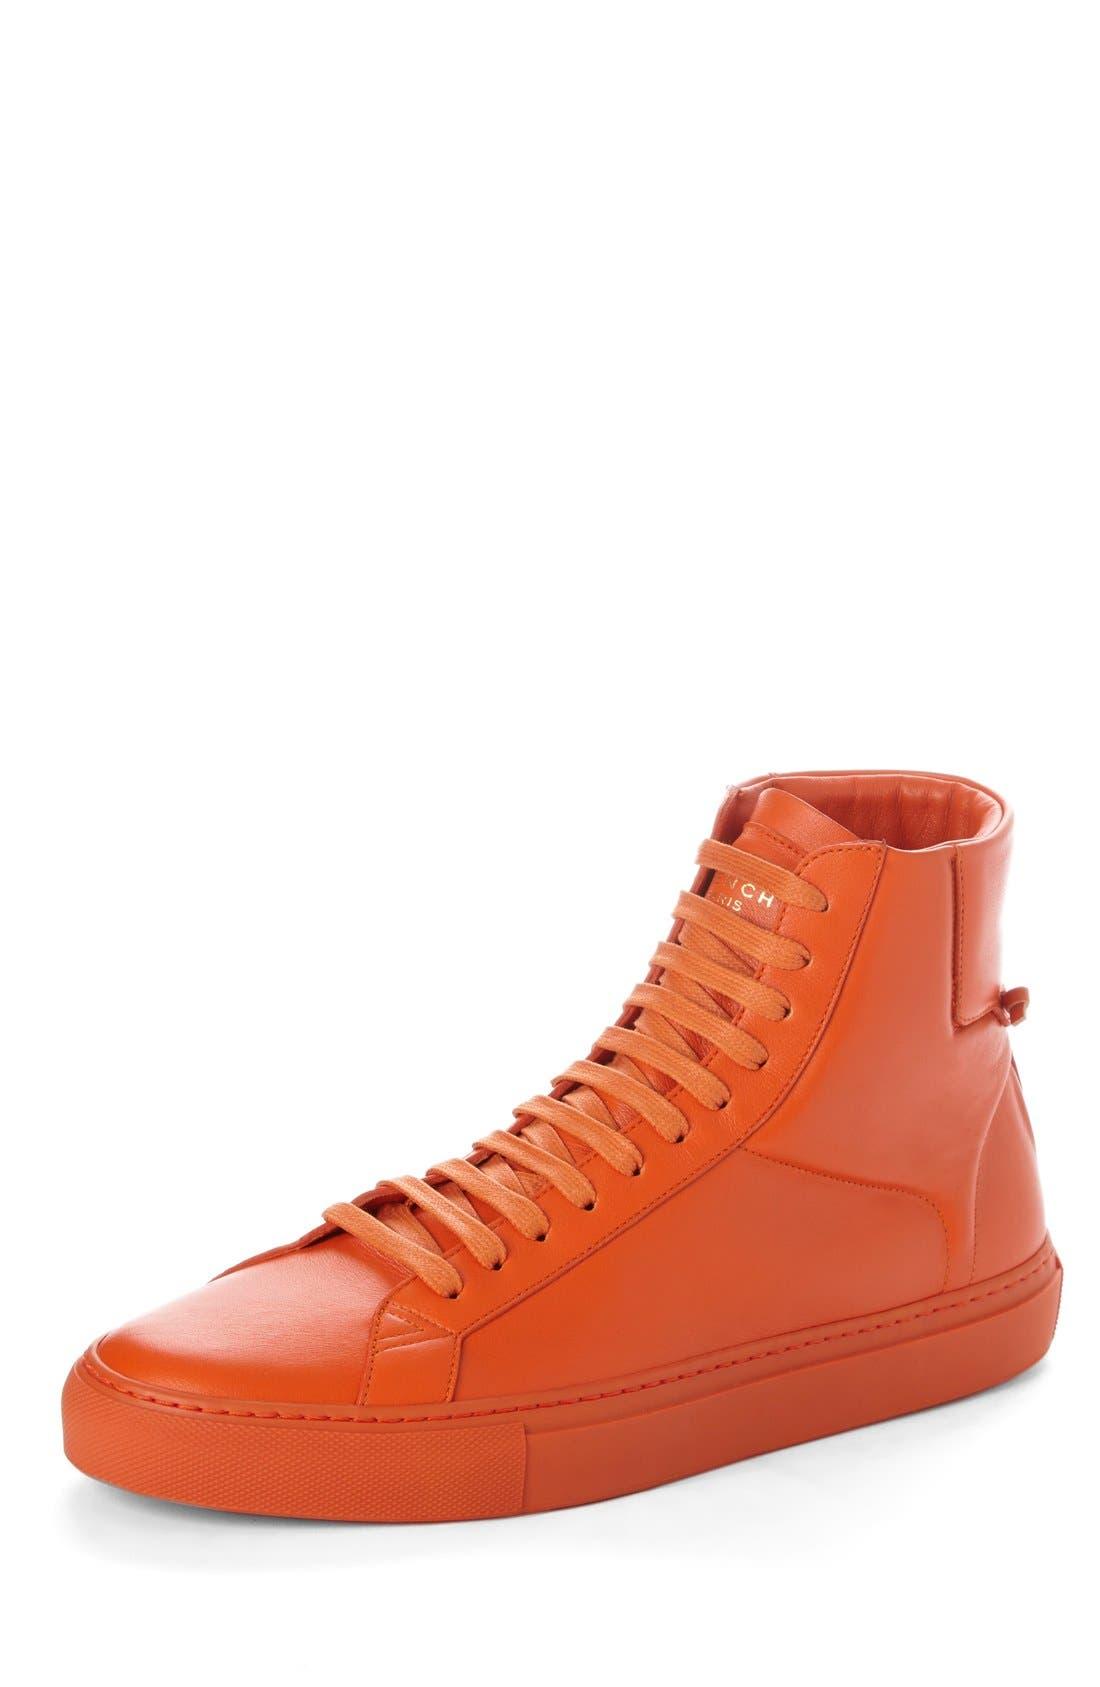 Main Image - Givenchy 'Urban Knots' High Top Sneaker (Men)